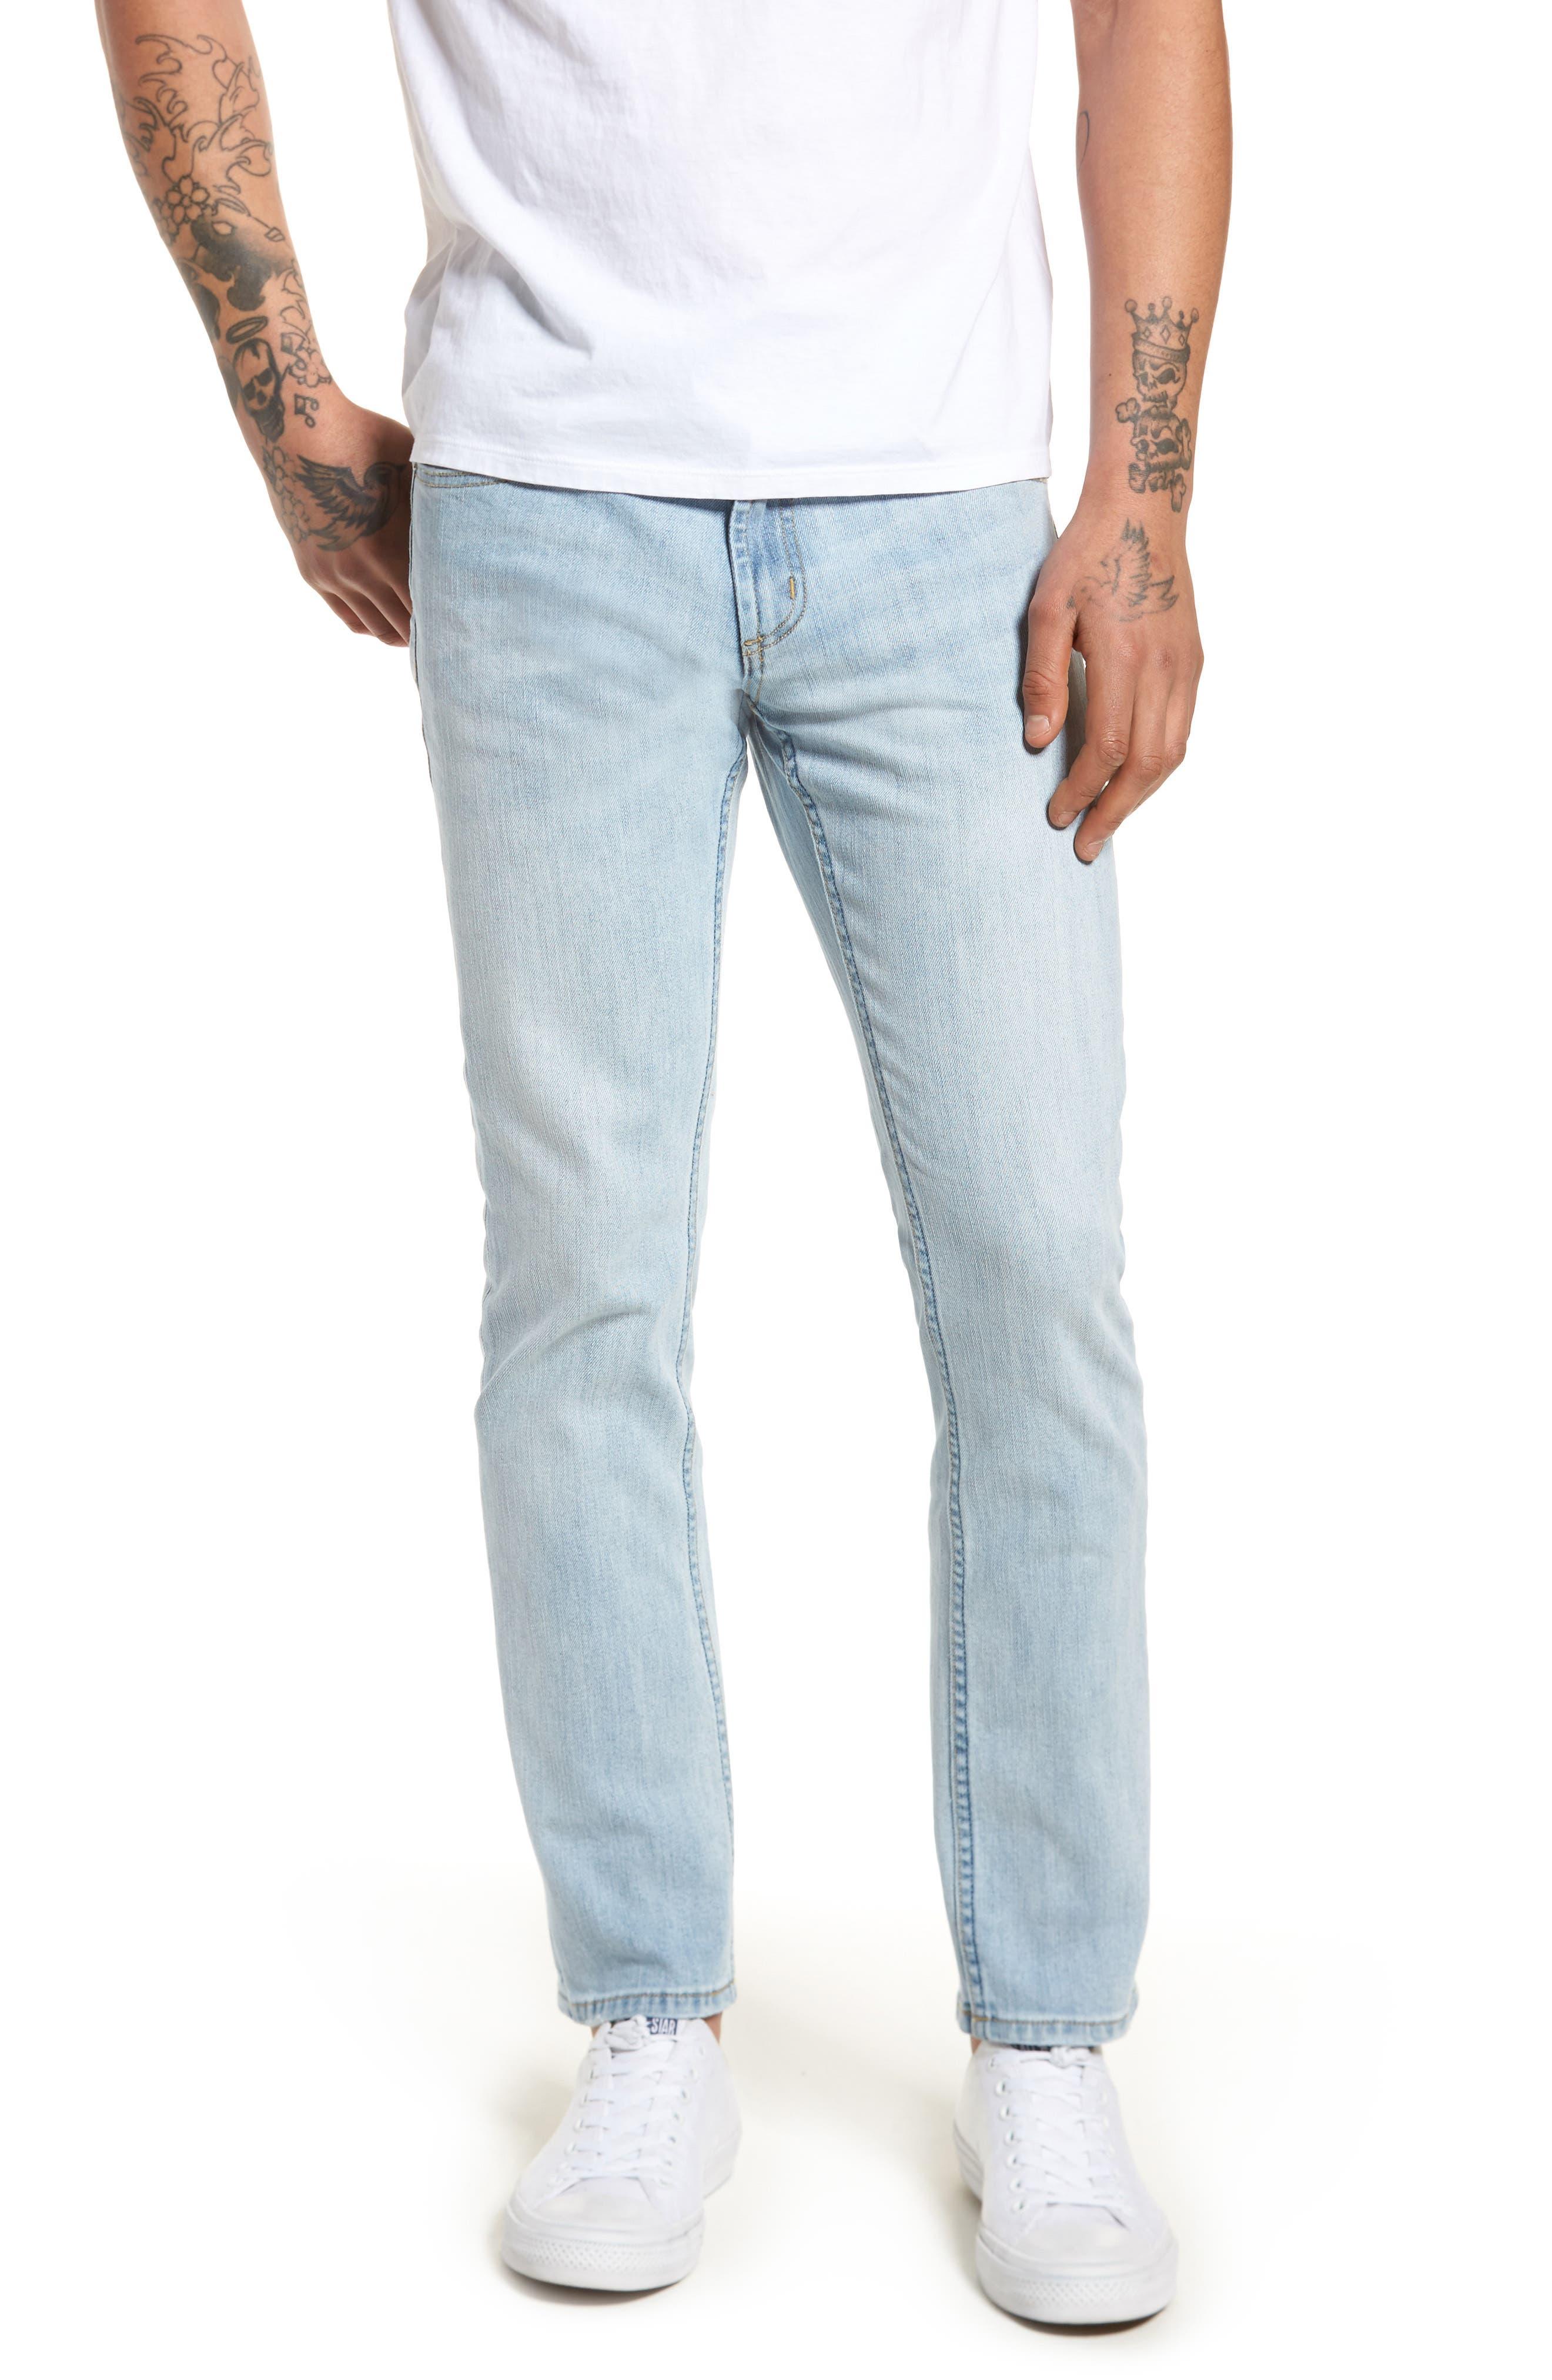 Juvee II Skinny Fit Jeans,                         Main,                         color, 400